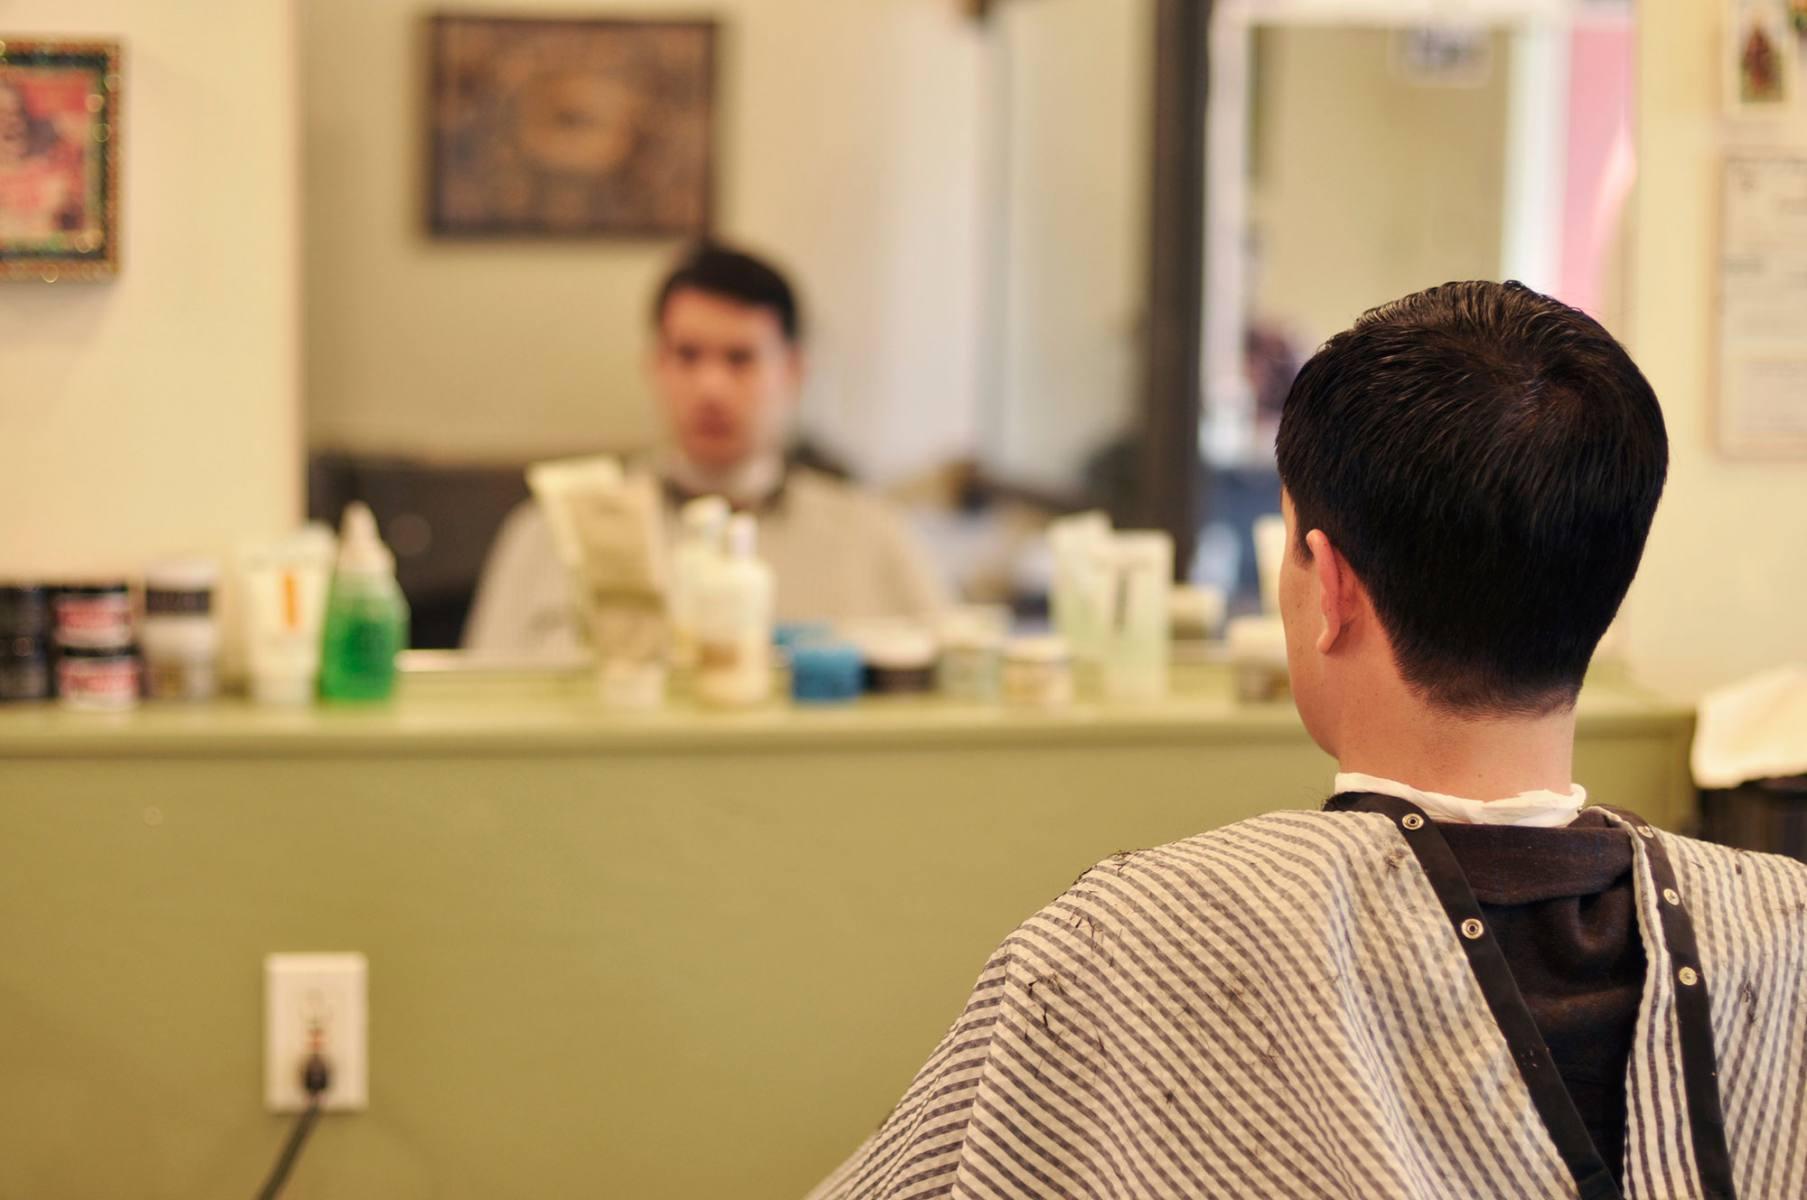 06-barber_01